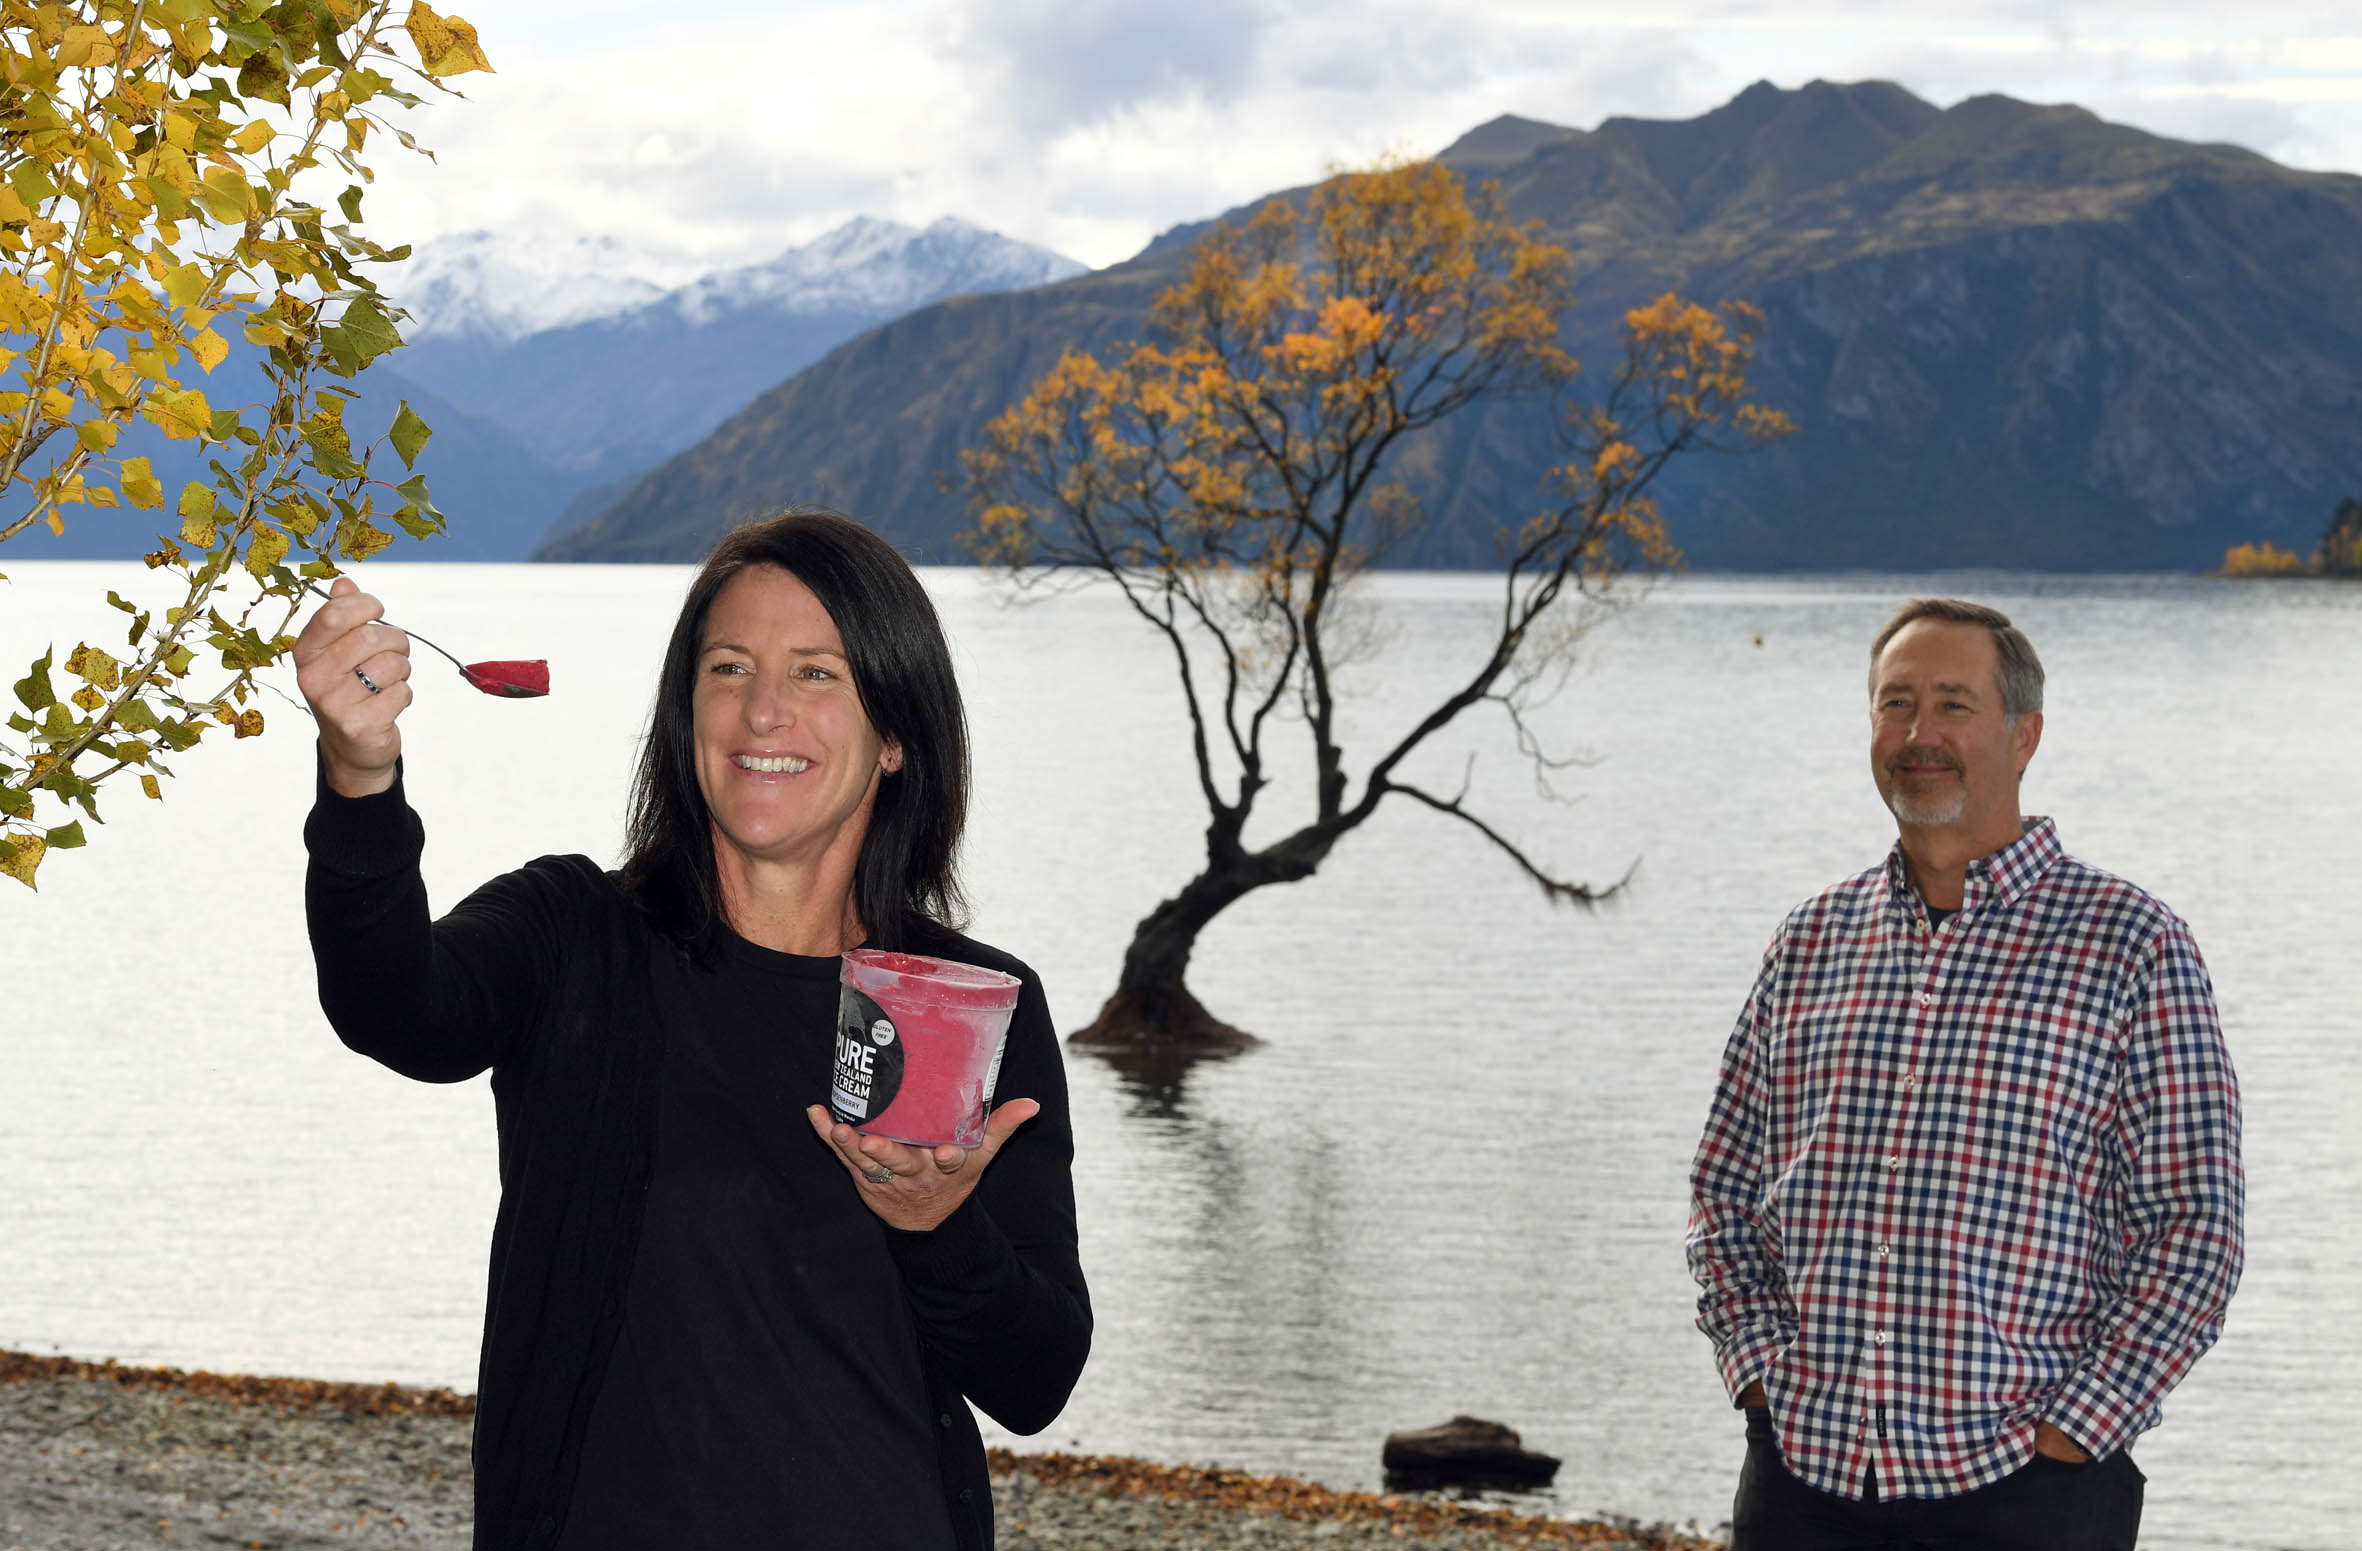 pure nz ice cream business mentors new zealand